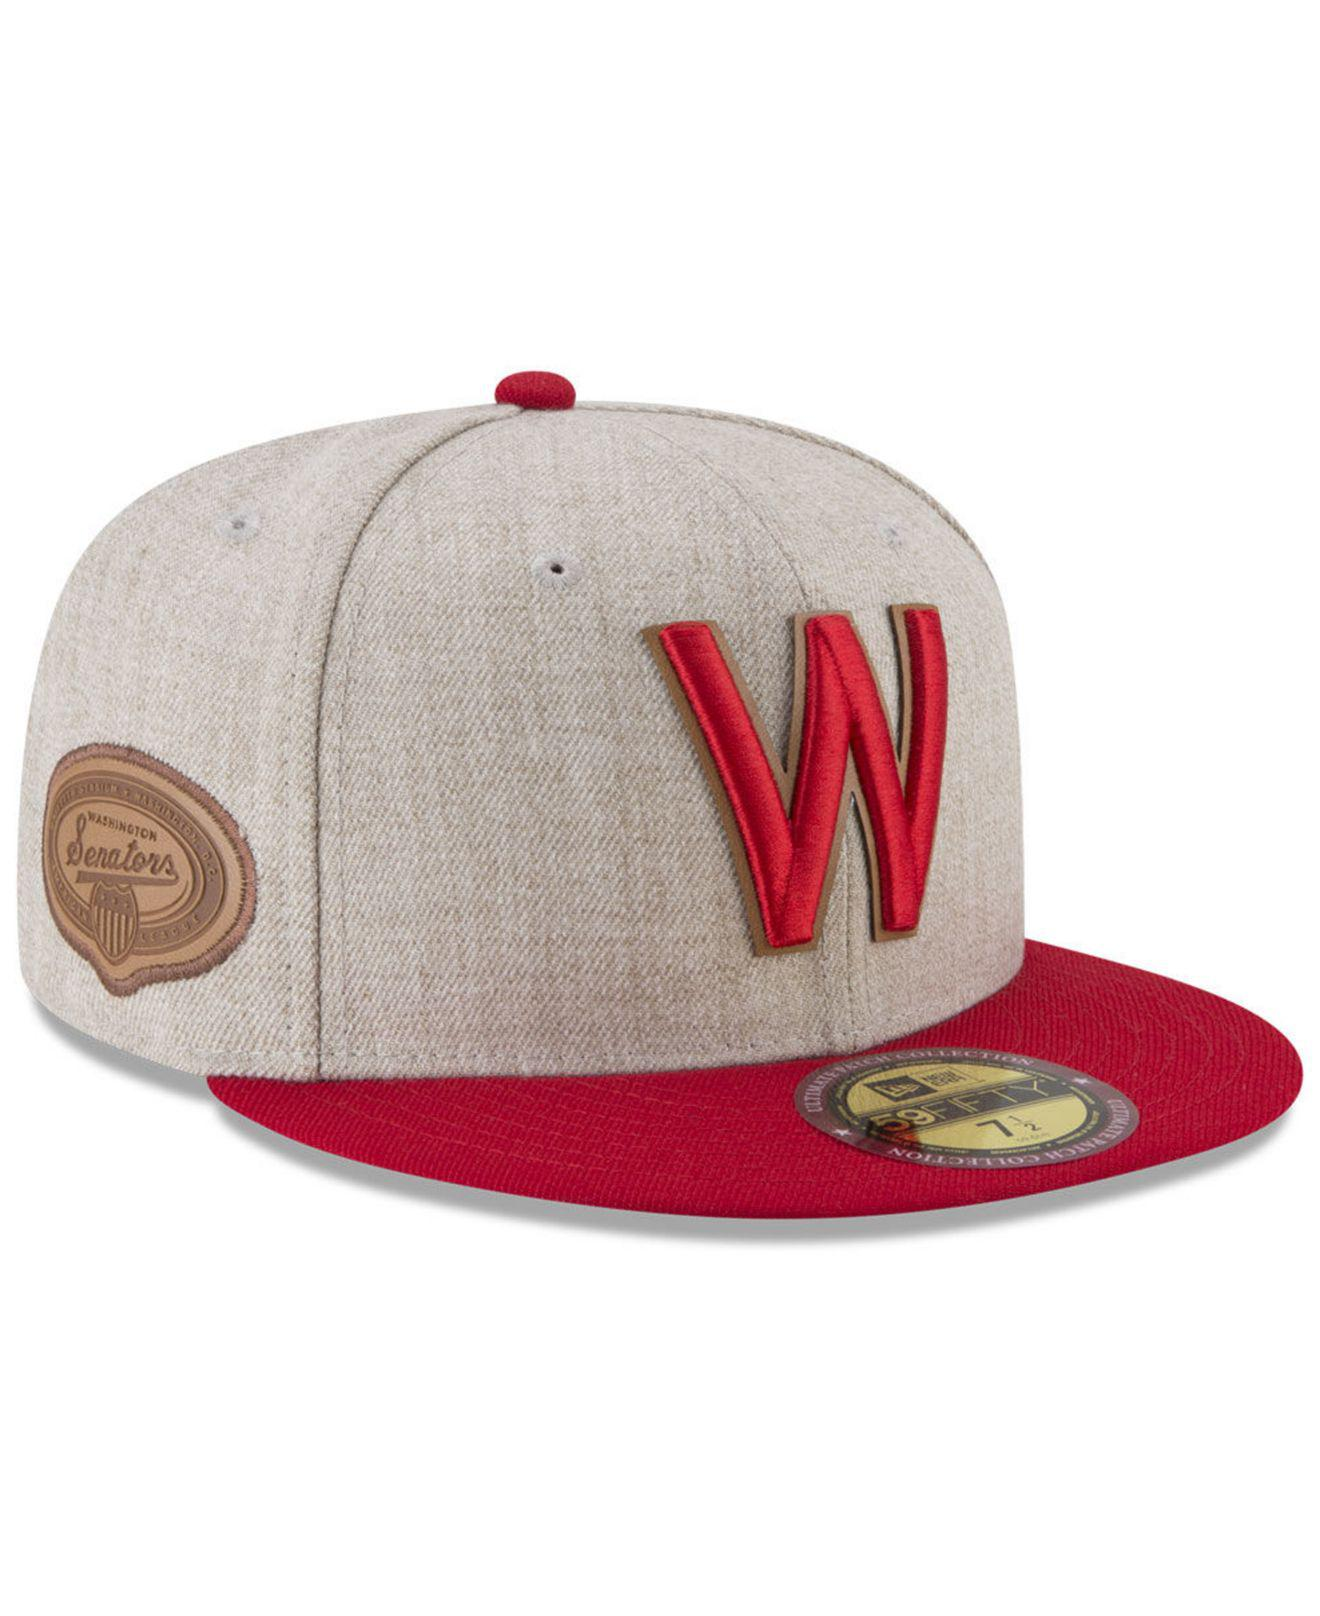 2519a6d24d03b6 KTZ. Men's Red Washington Senators Leather Ultimate Patch Collection  59fifty Fitted Cap